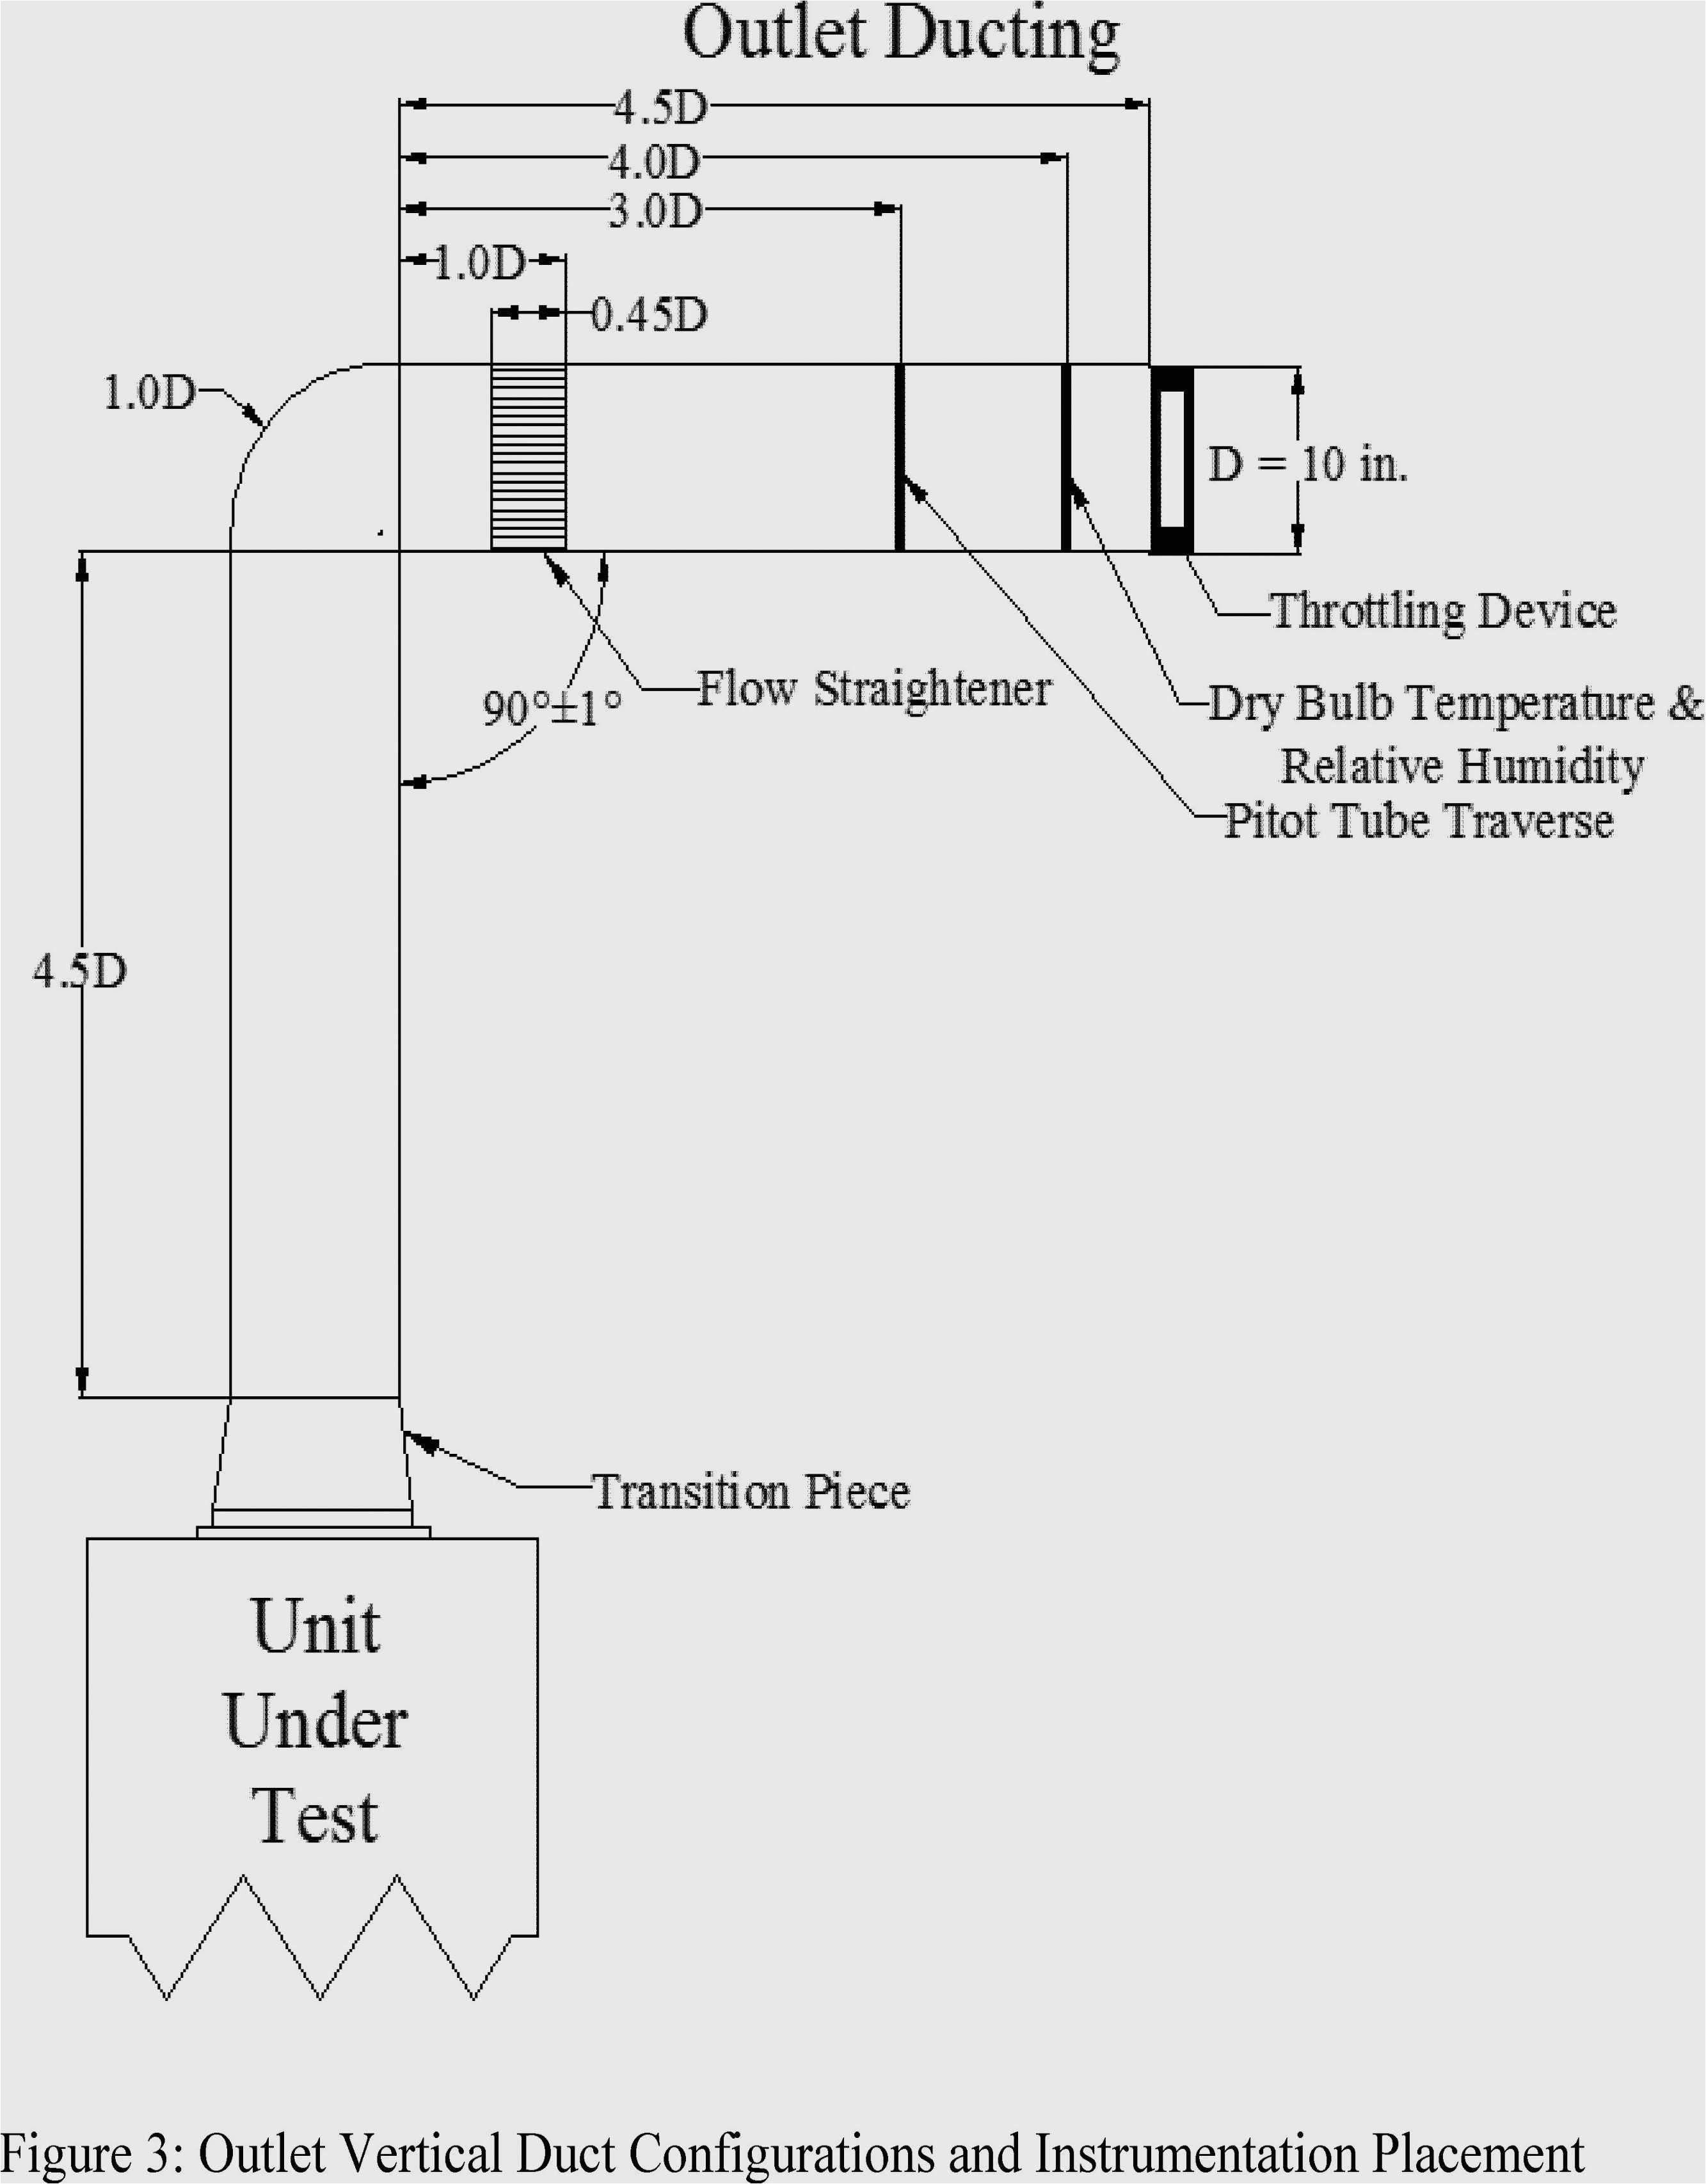 3 Way Switch Diagram Wiring Wiring Diagram 3 Way Switch Inspirational 3 Way Switch Wiring